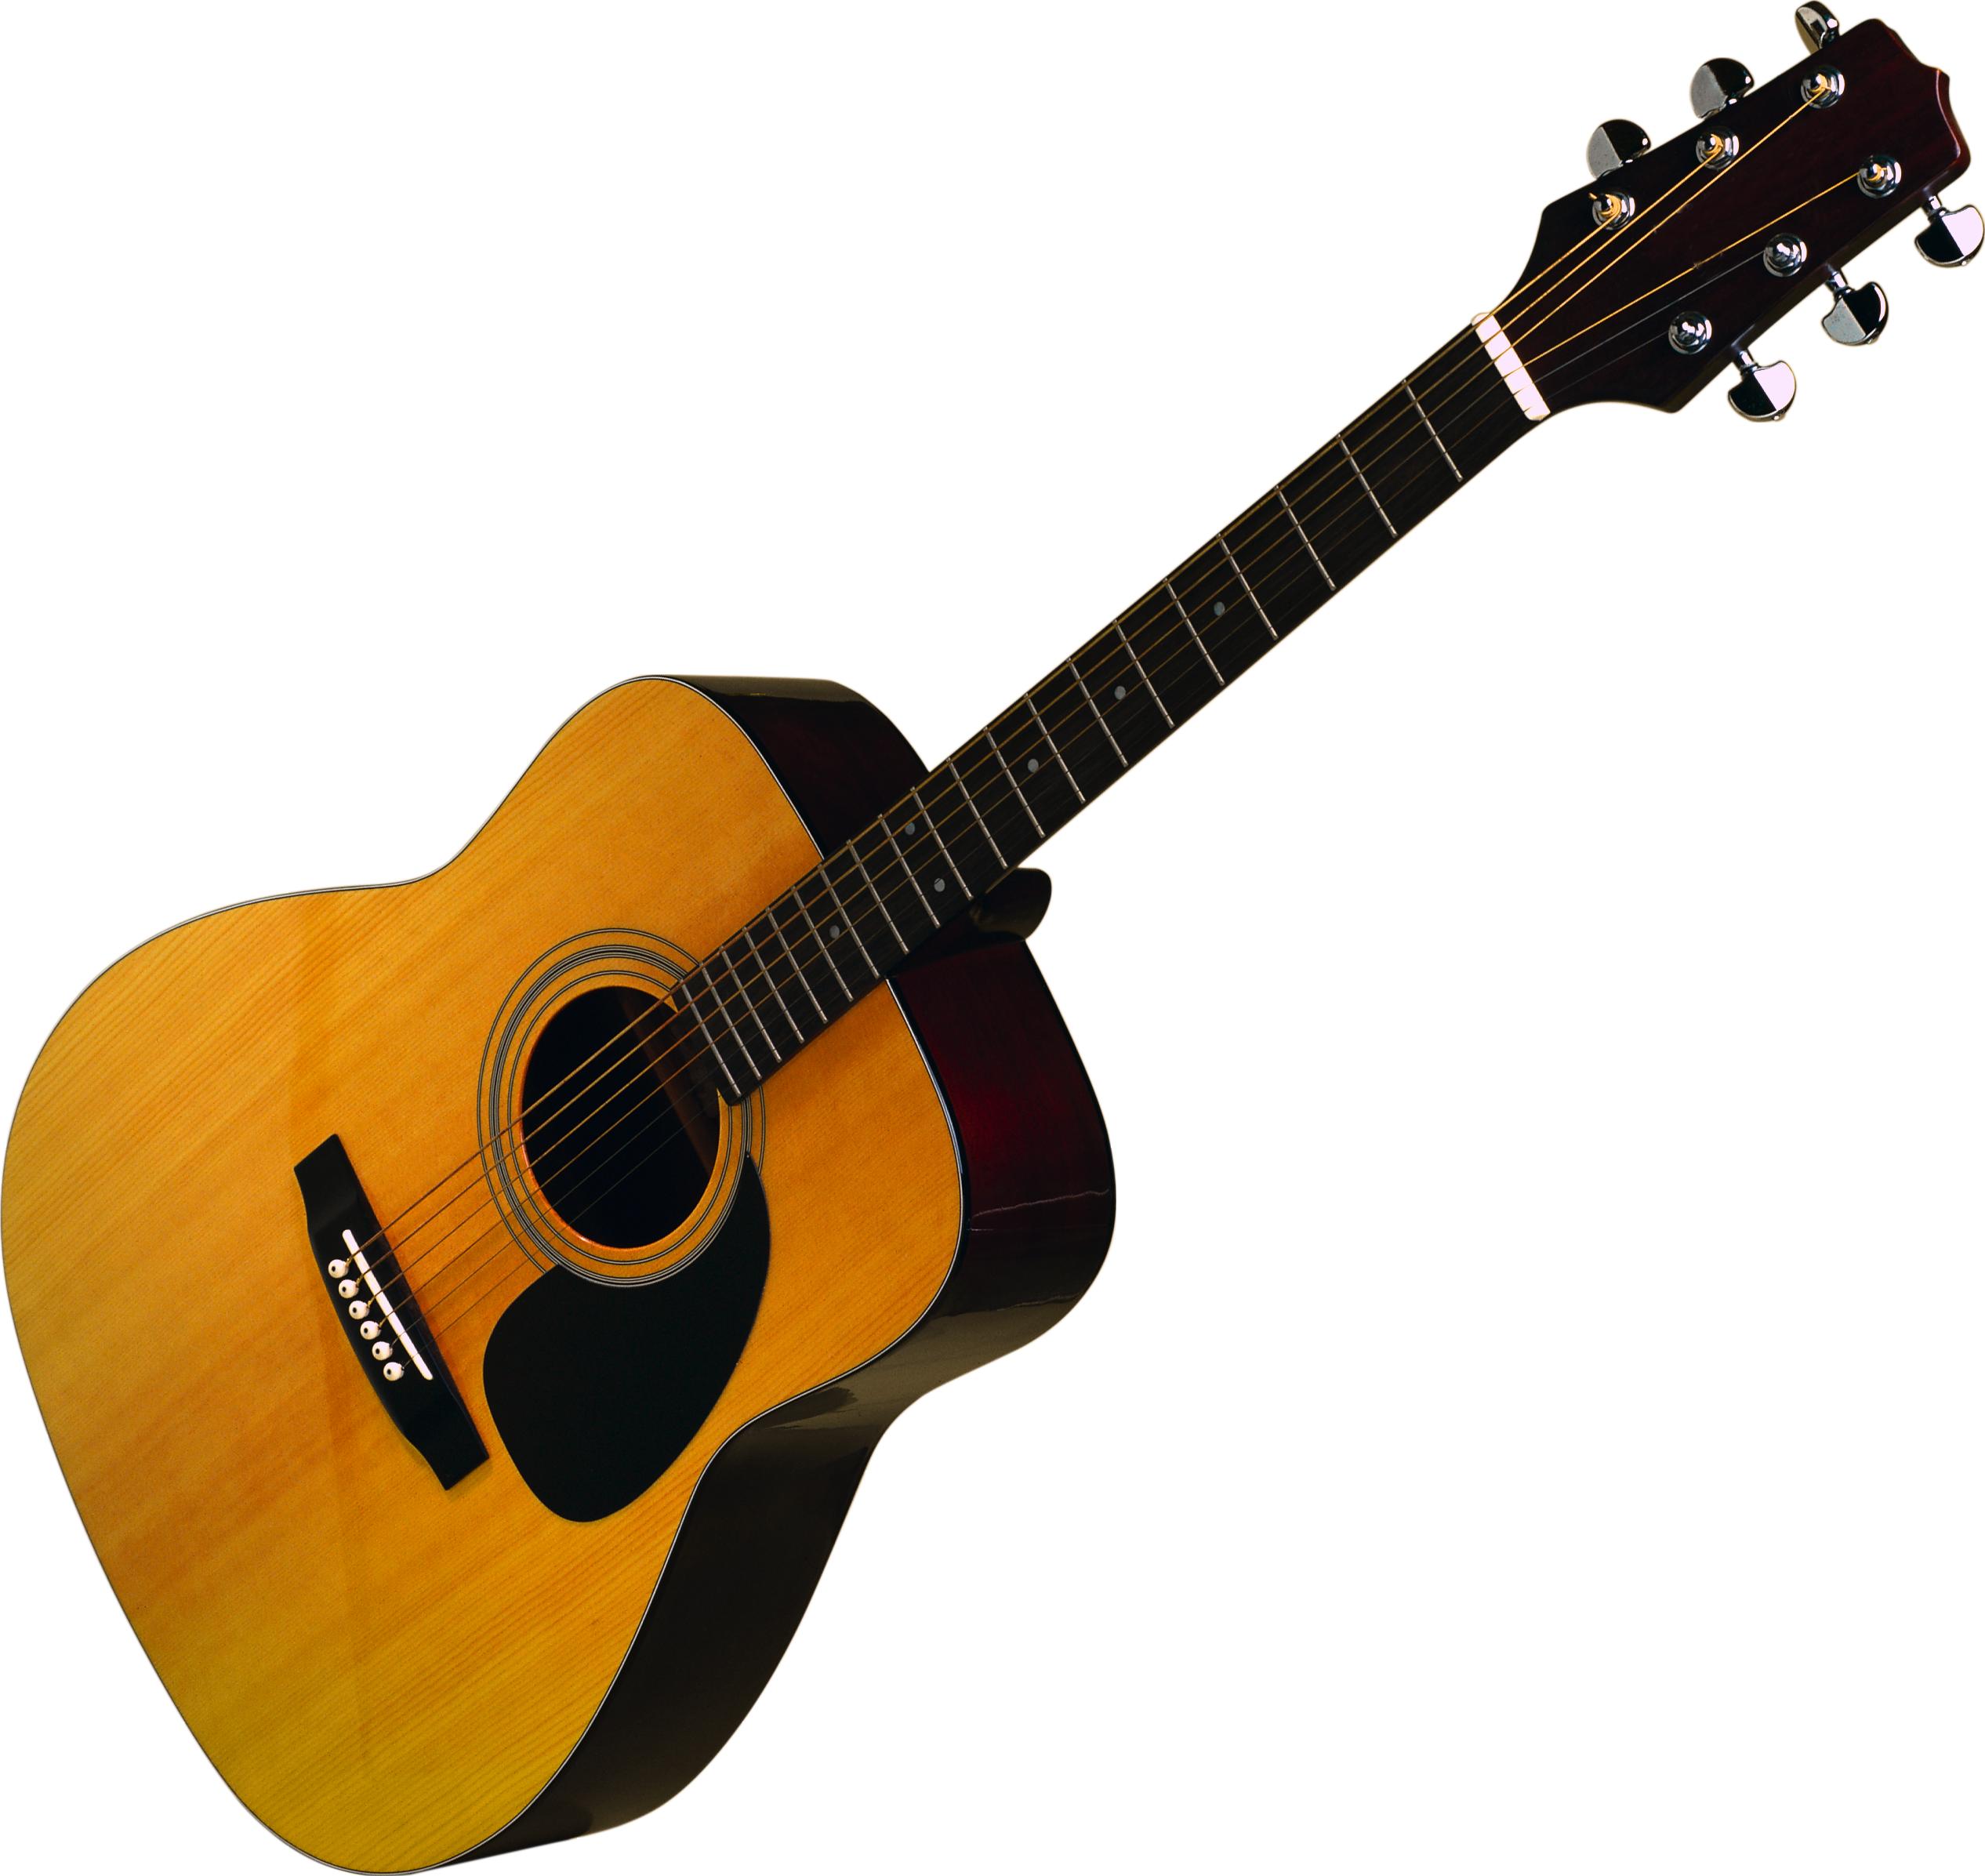 banner royalty free Png image . Guitar clipart vihuela